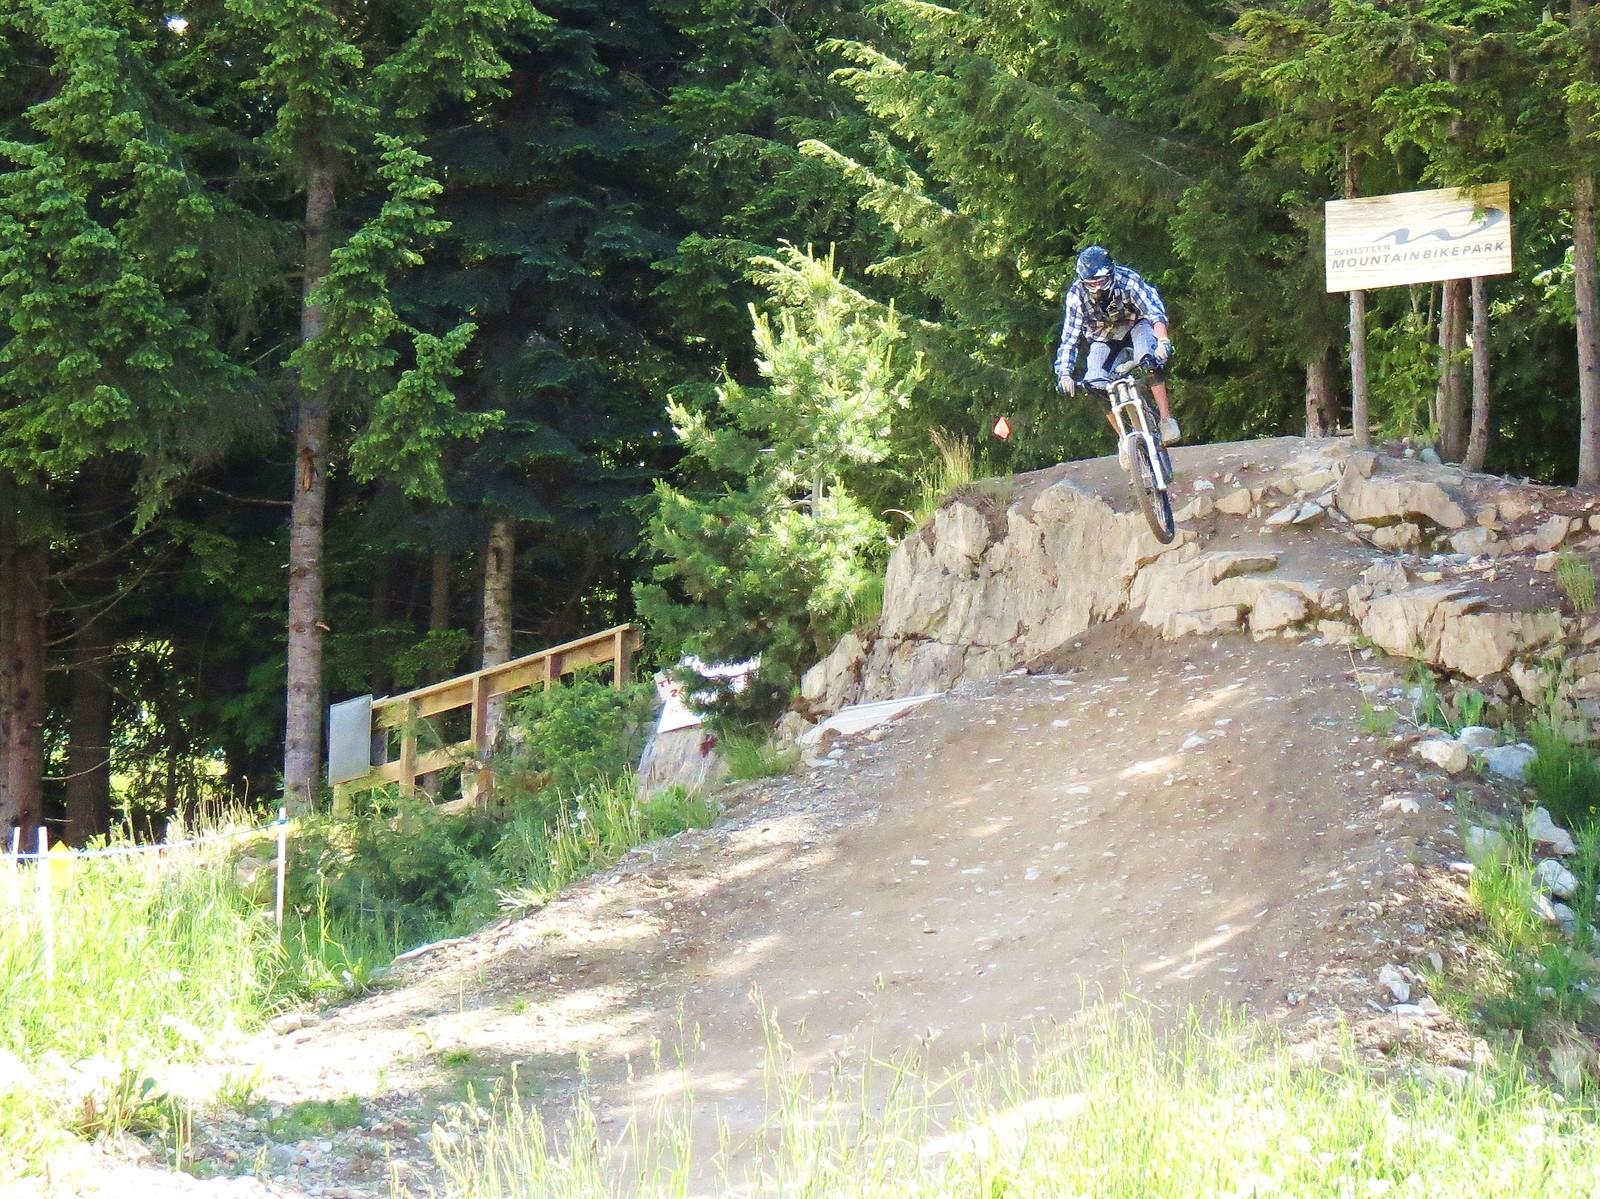 IMG 3532 (2) - Moosey - Mountain Biking Pictures - Vital MTB